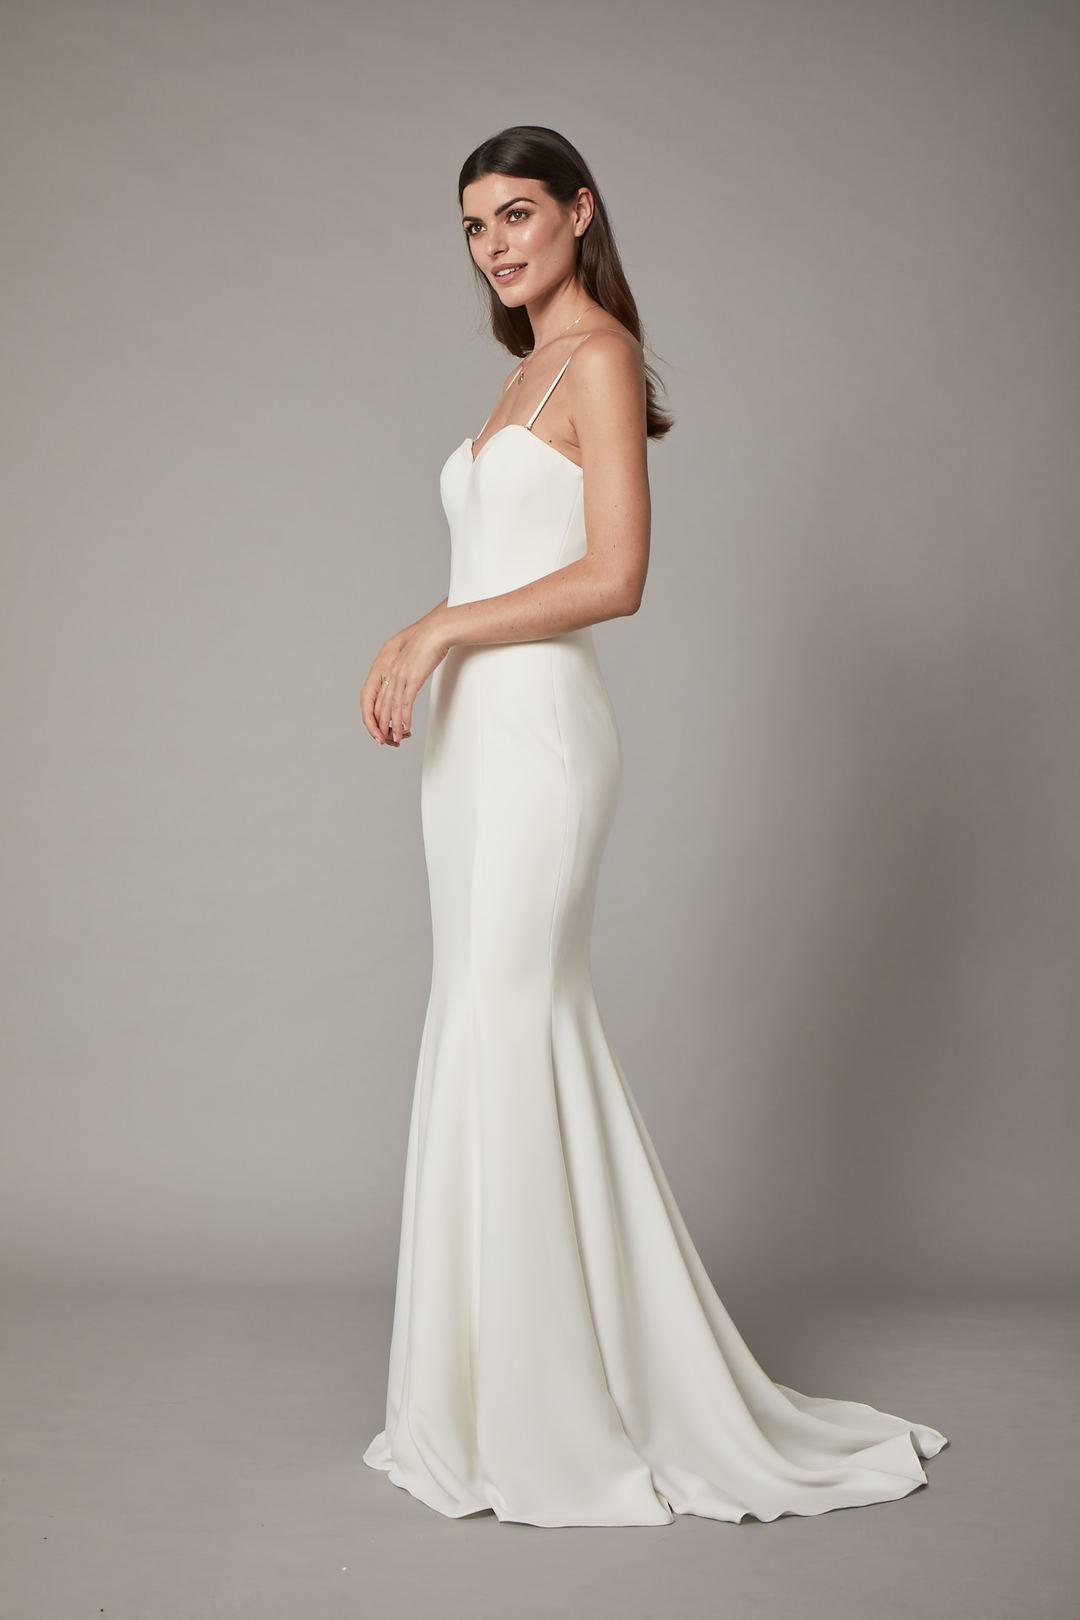 rita gown dress photo